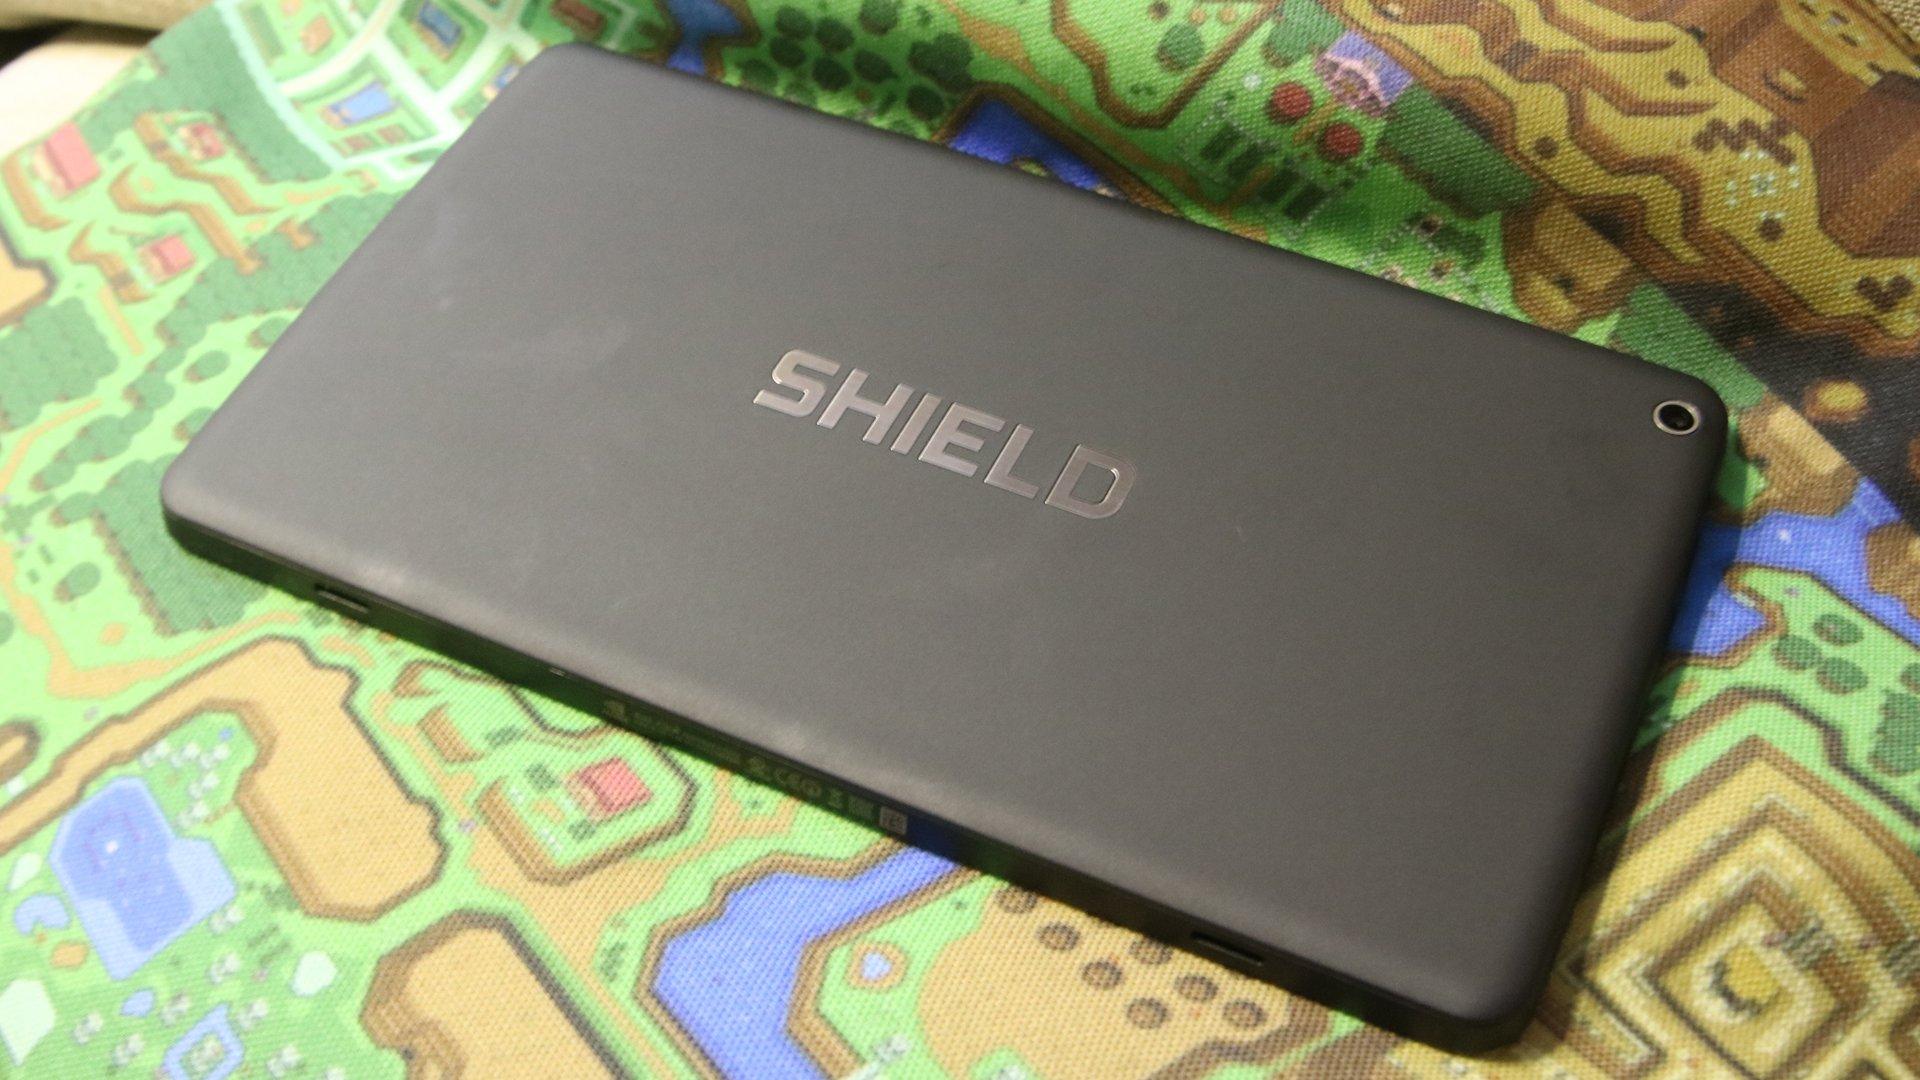 Nvidia shield tablet review uk dating